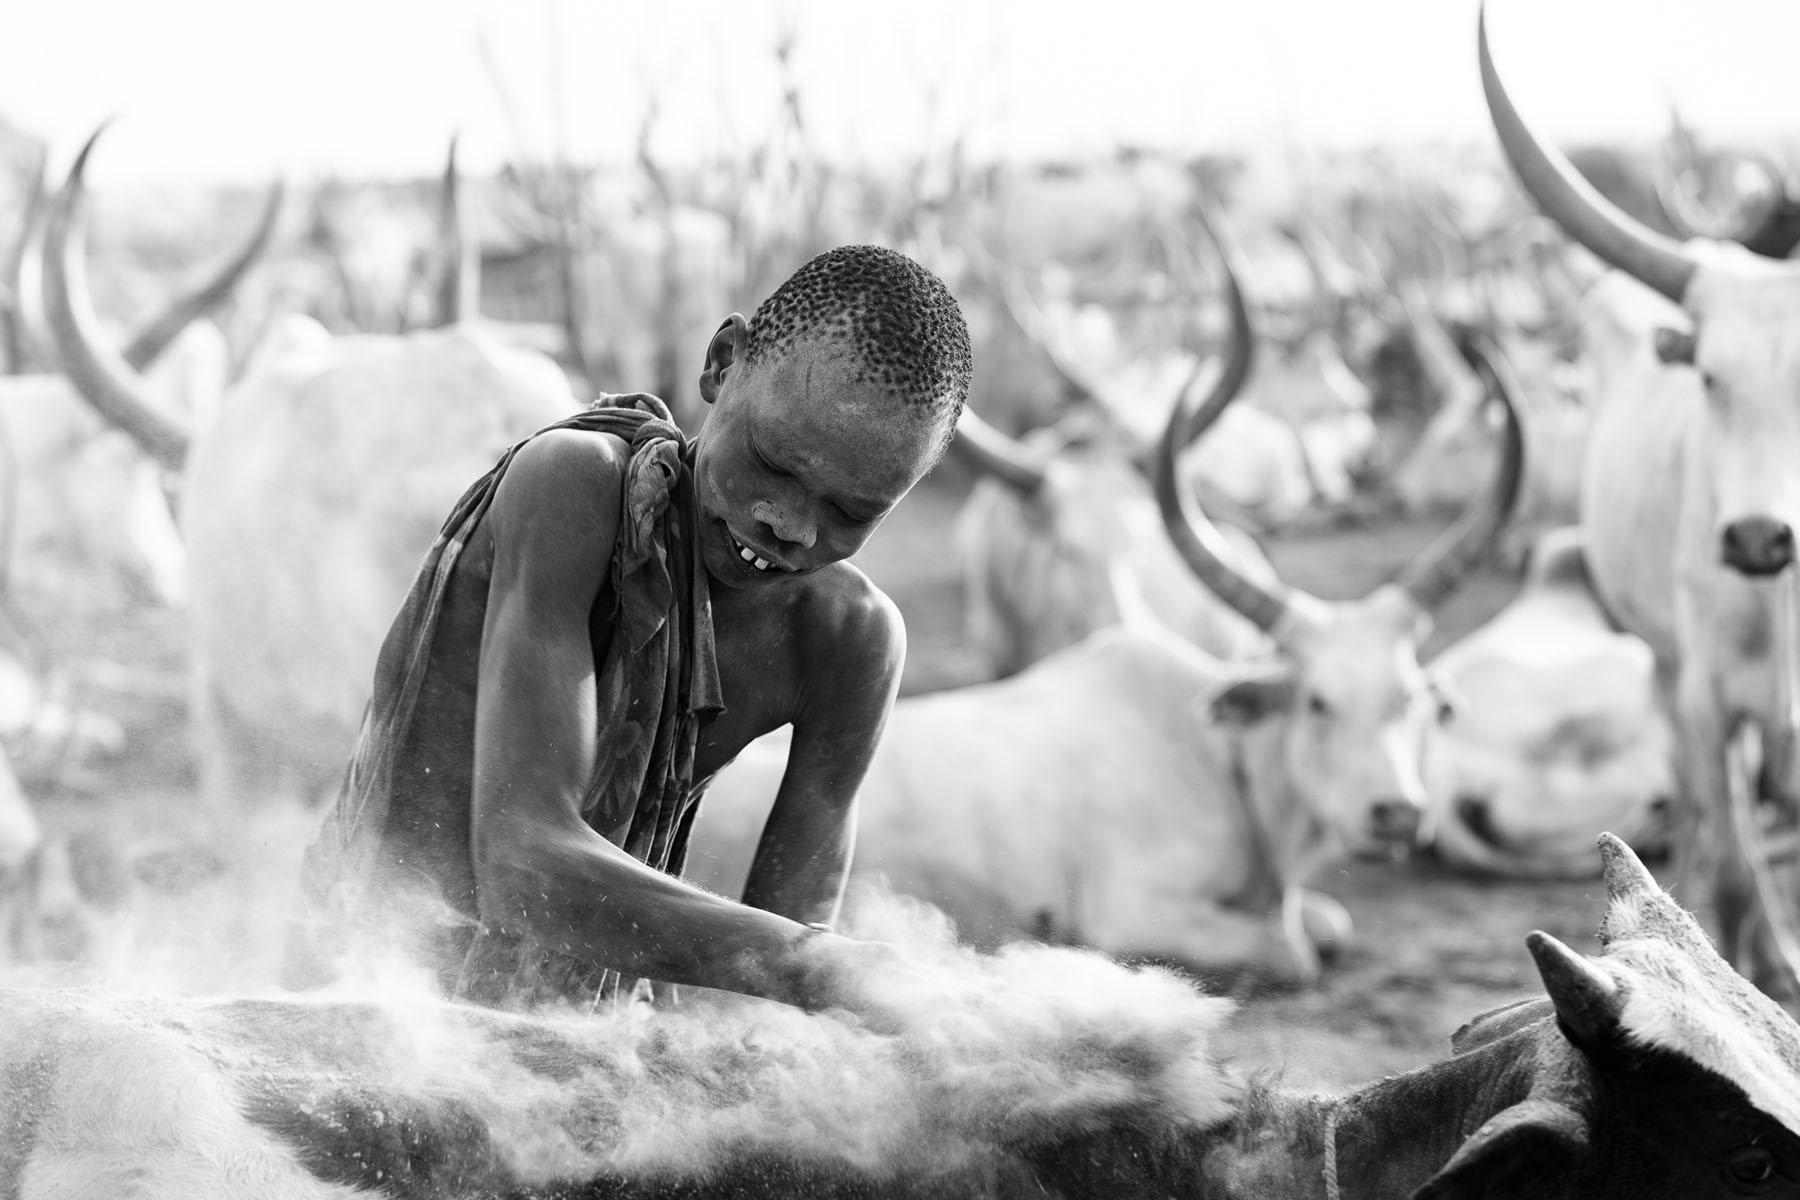 A Mundari boy rubs ash into the skin of his cow © Joe Buergi